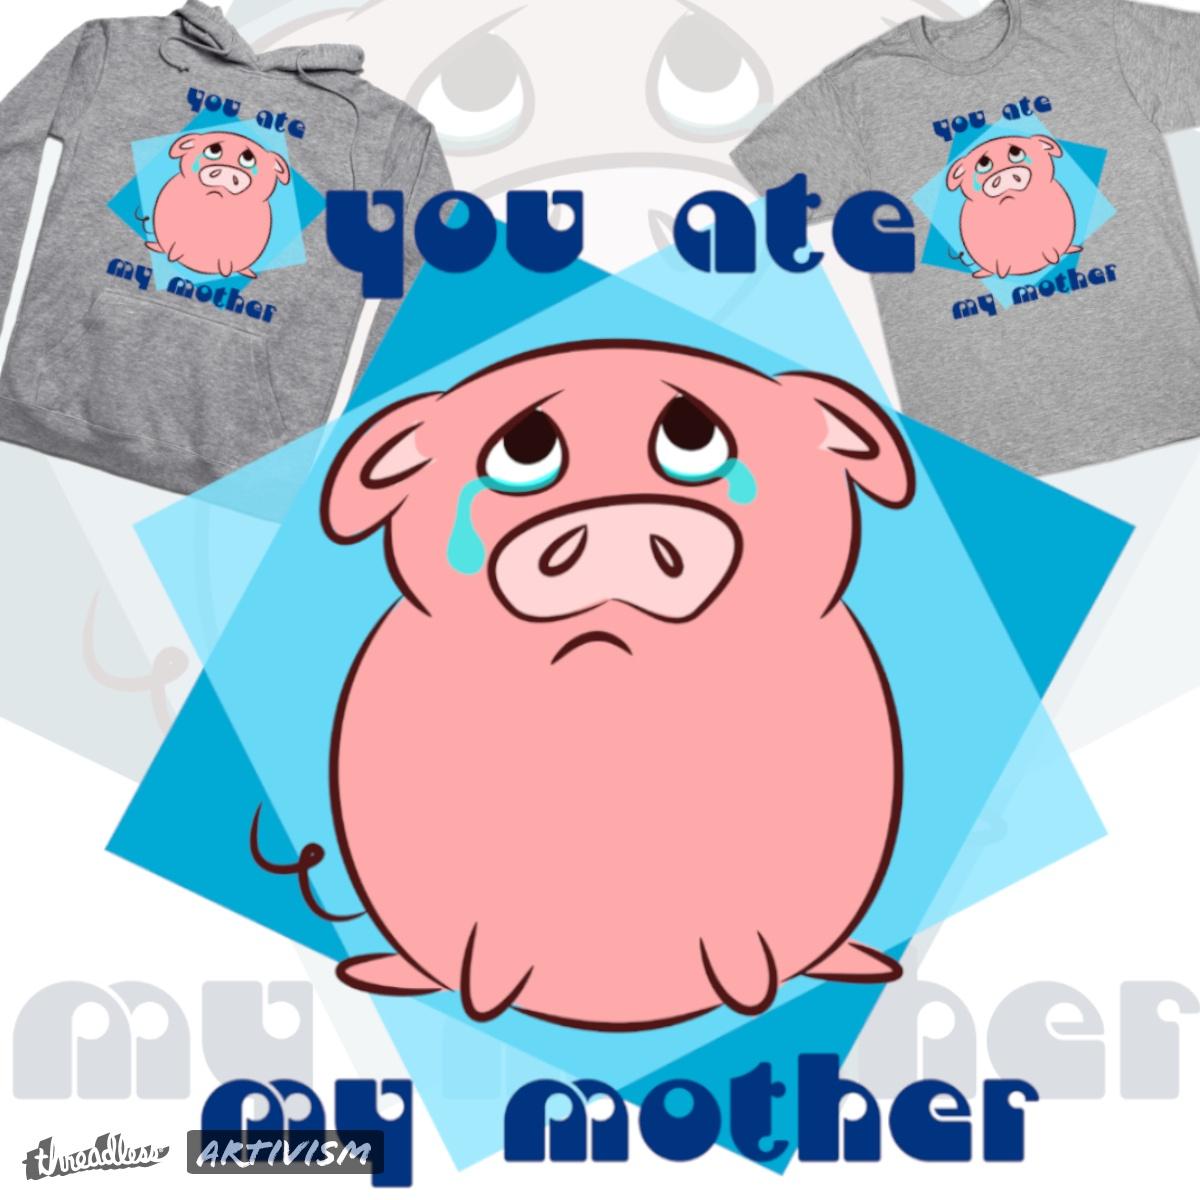 Sad piggy, a cool t-shirt design